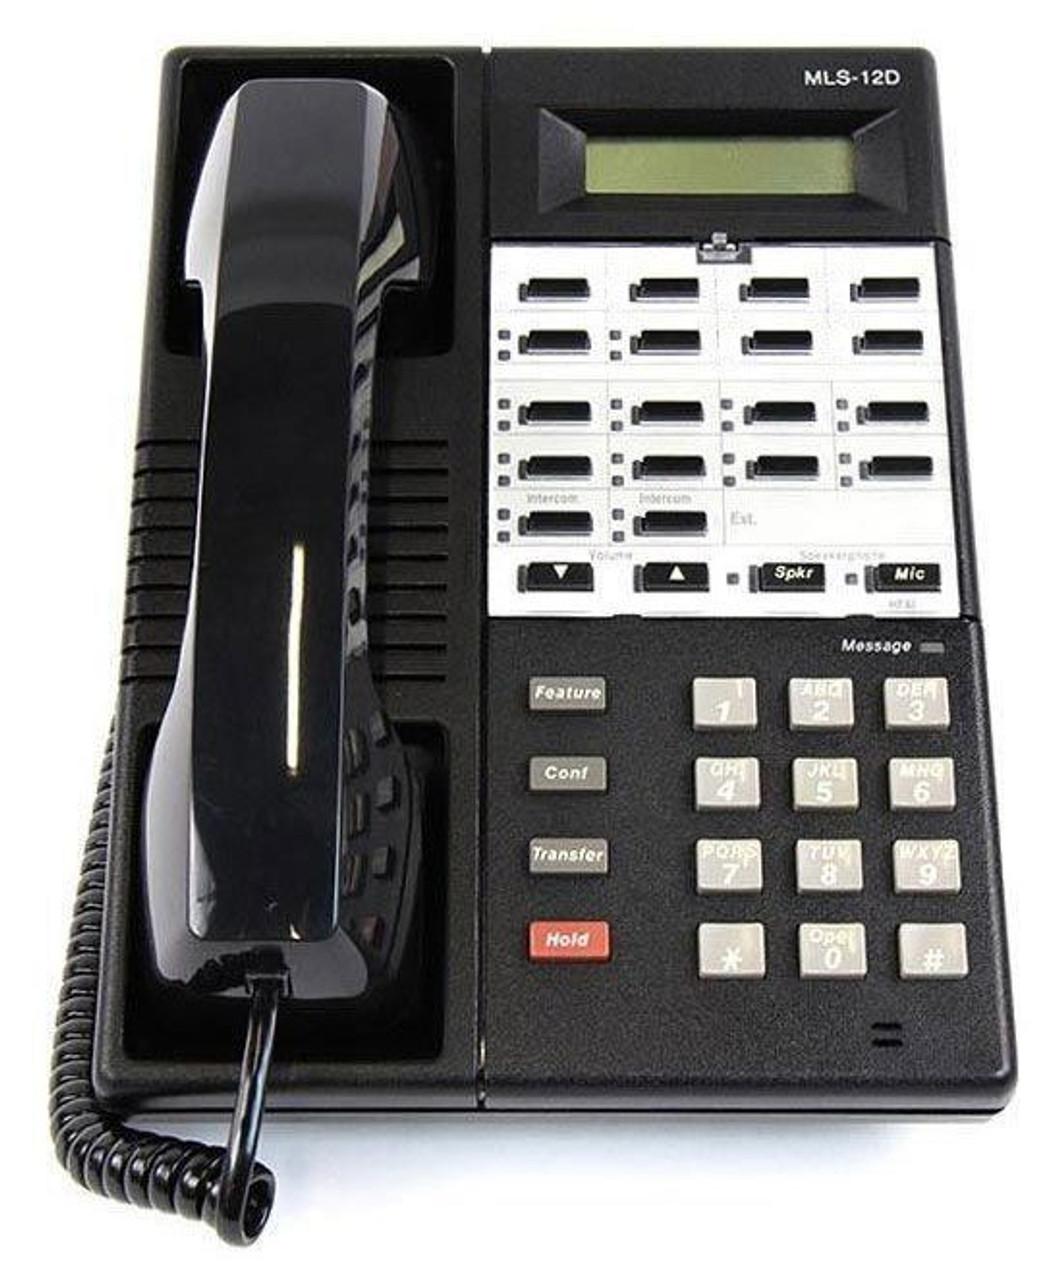 Telecom Systems FULLY REFURBISHED WHITE Avaya Partner 18D Phone ...